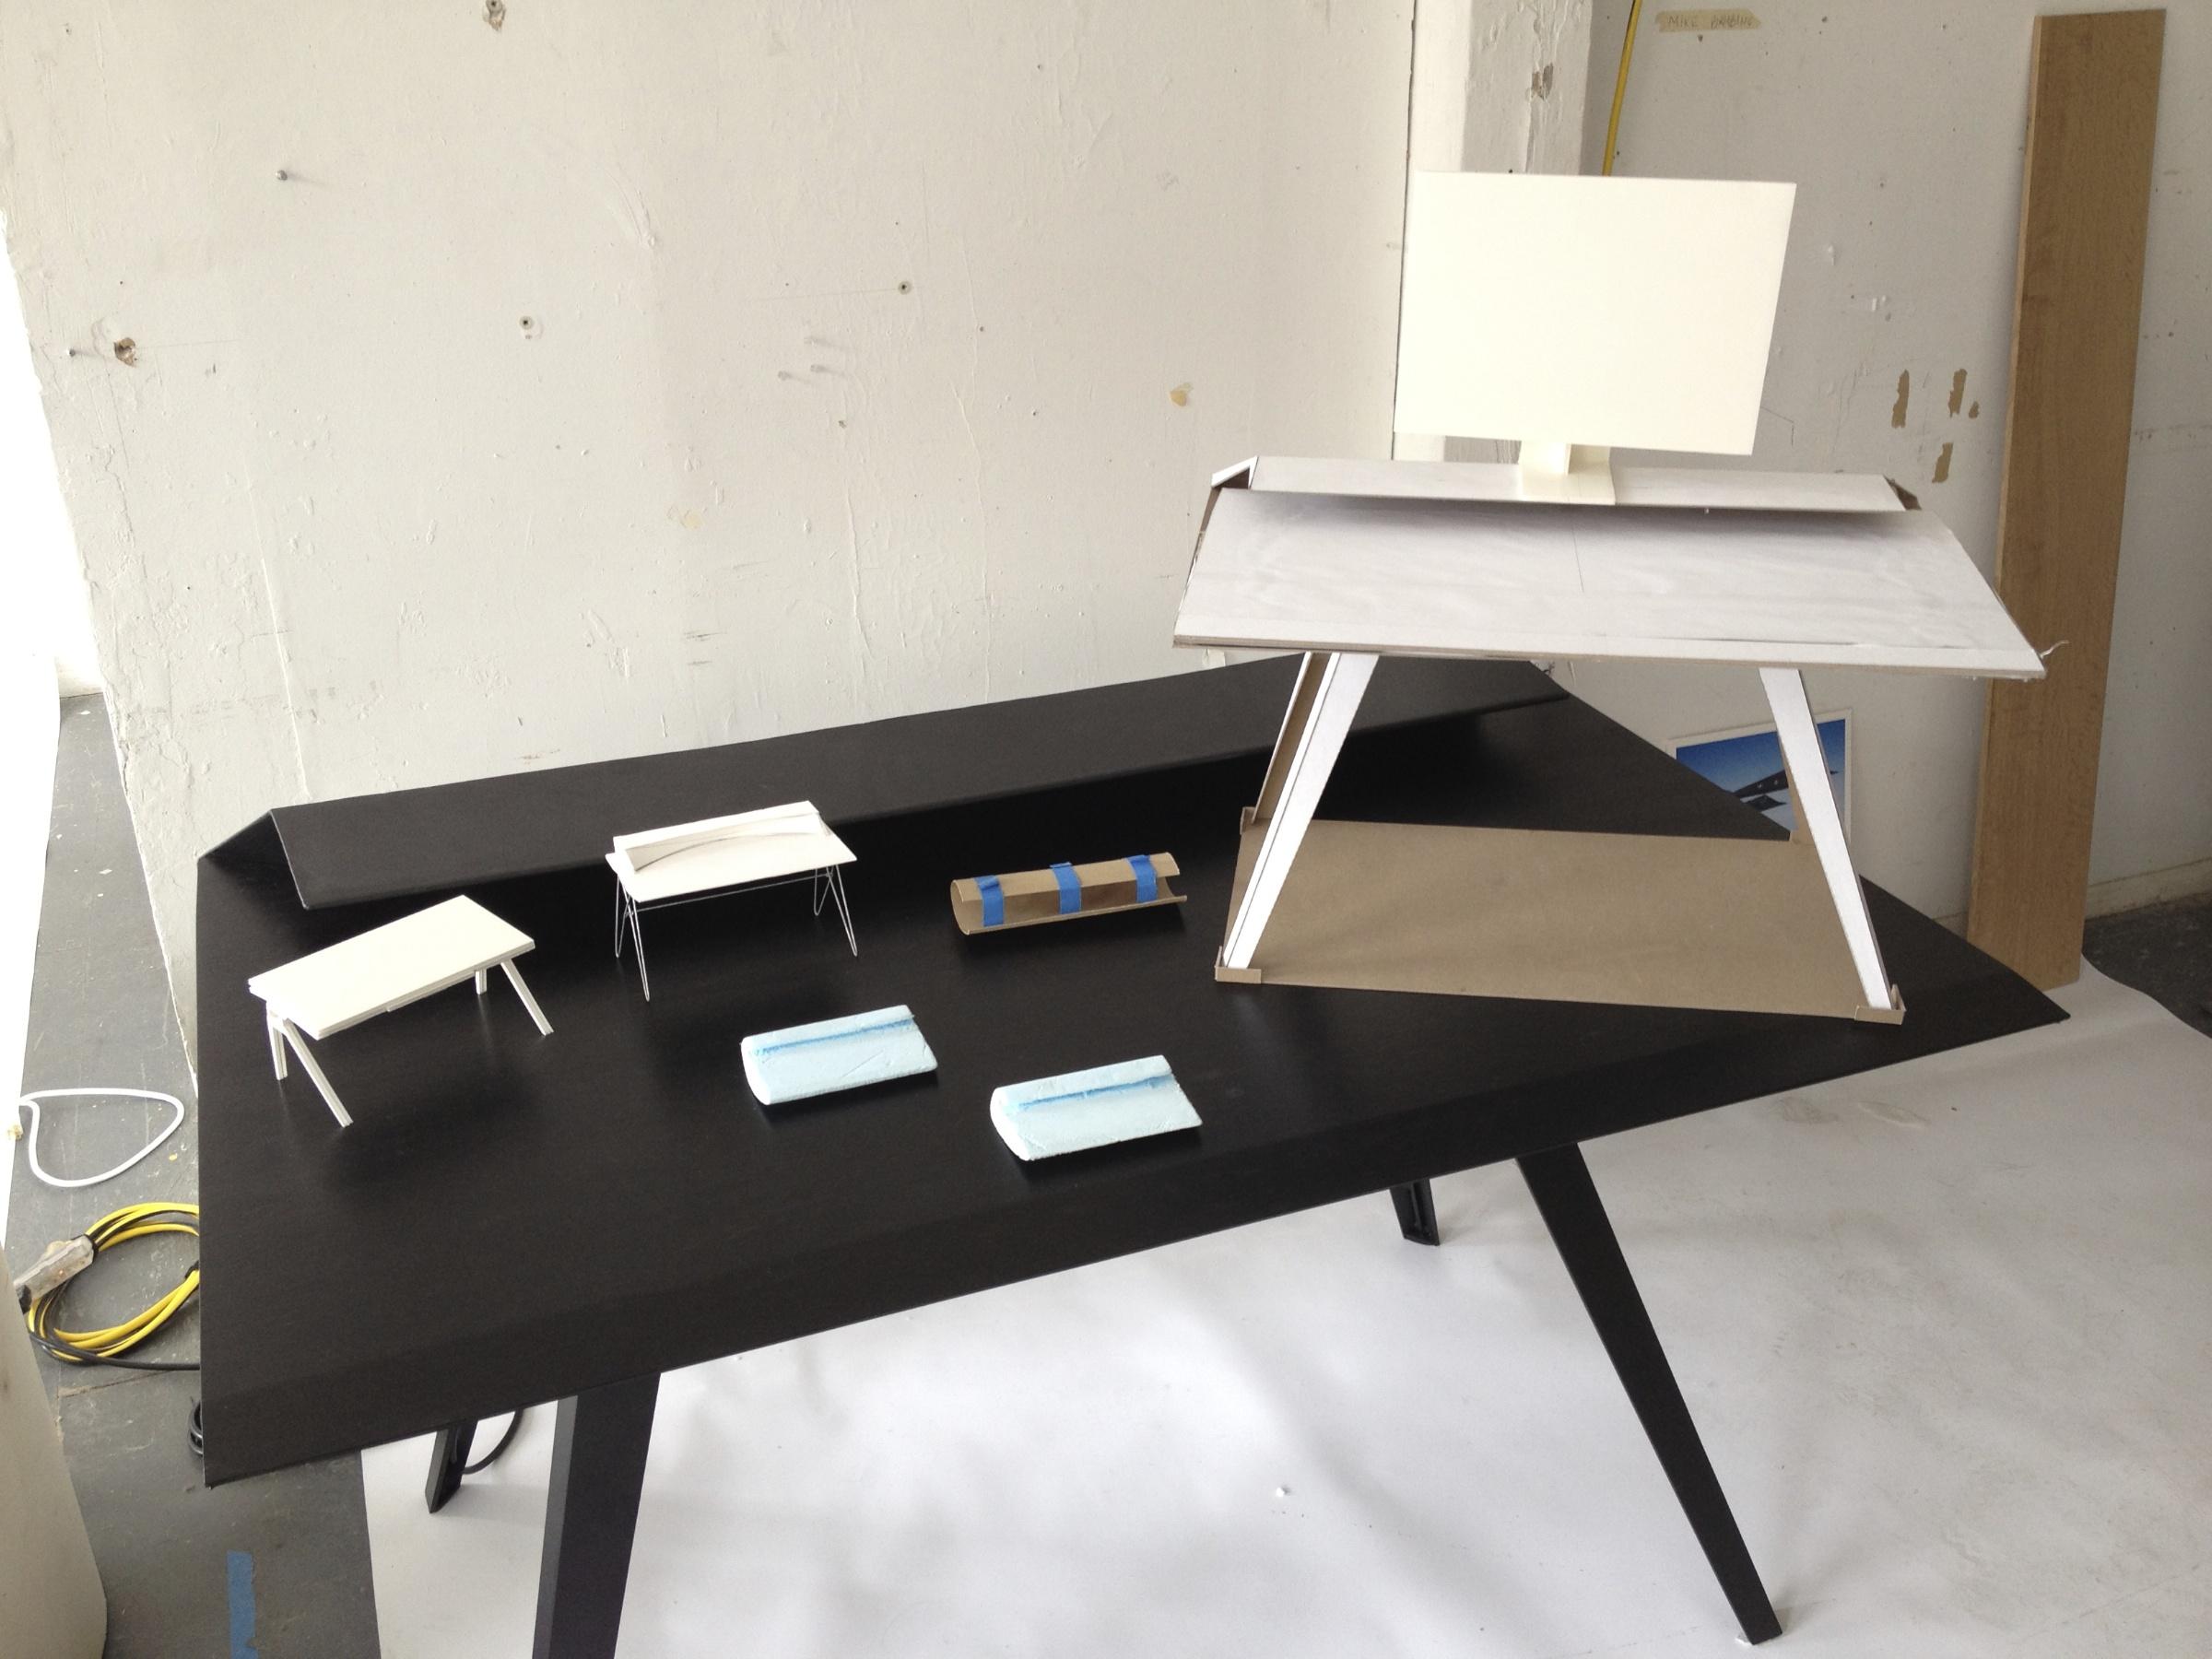 desk117p-1@2x.jpg